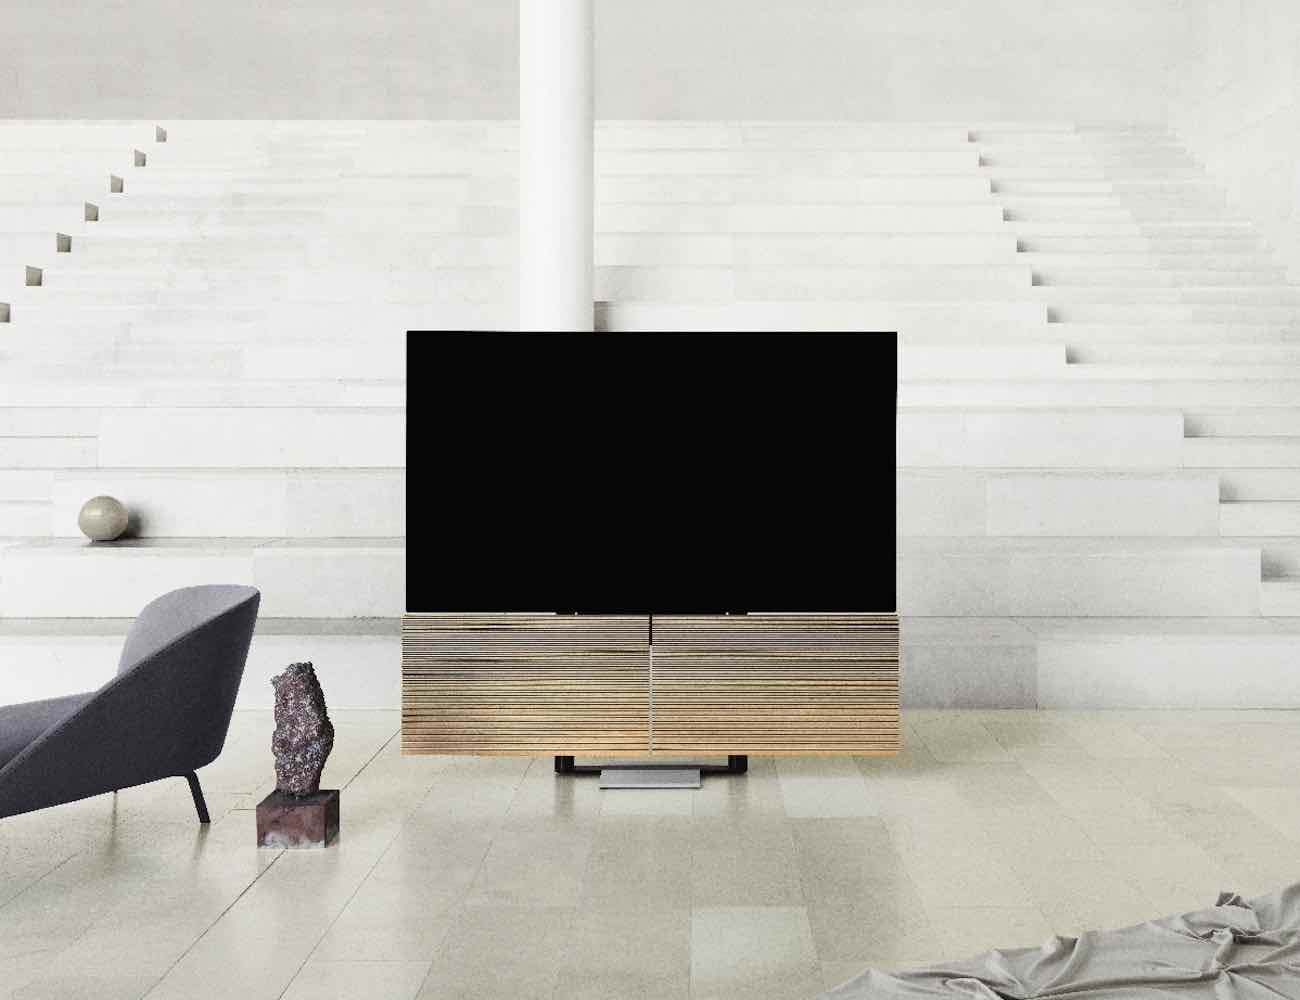 Bang & Olufsen Beovision Harmony Television